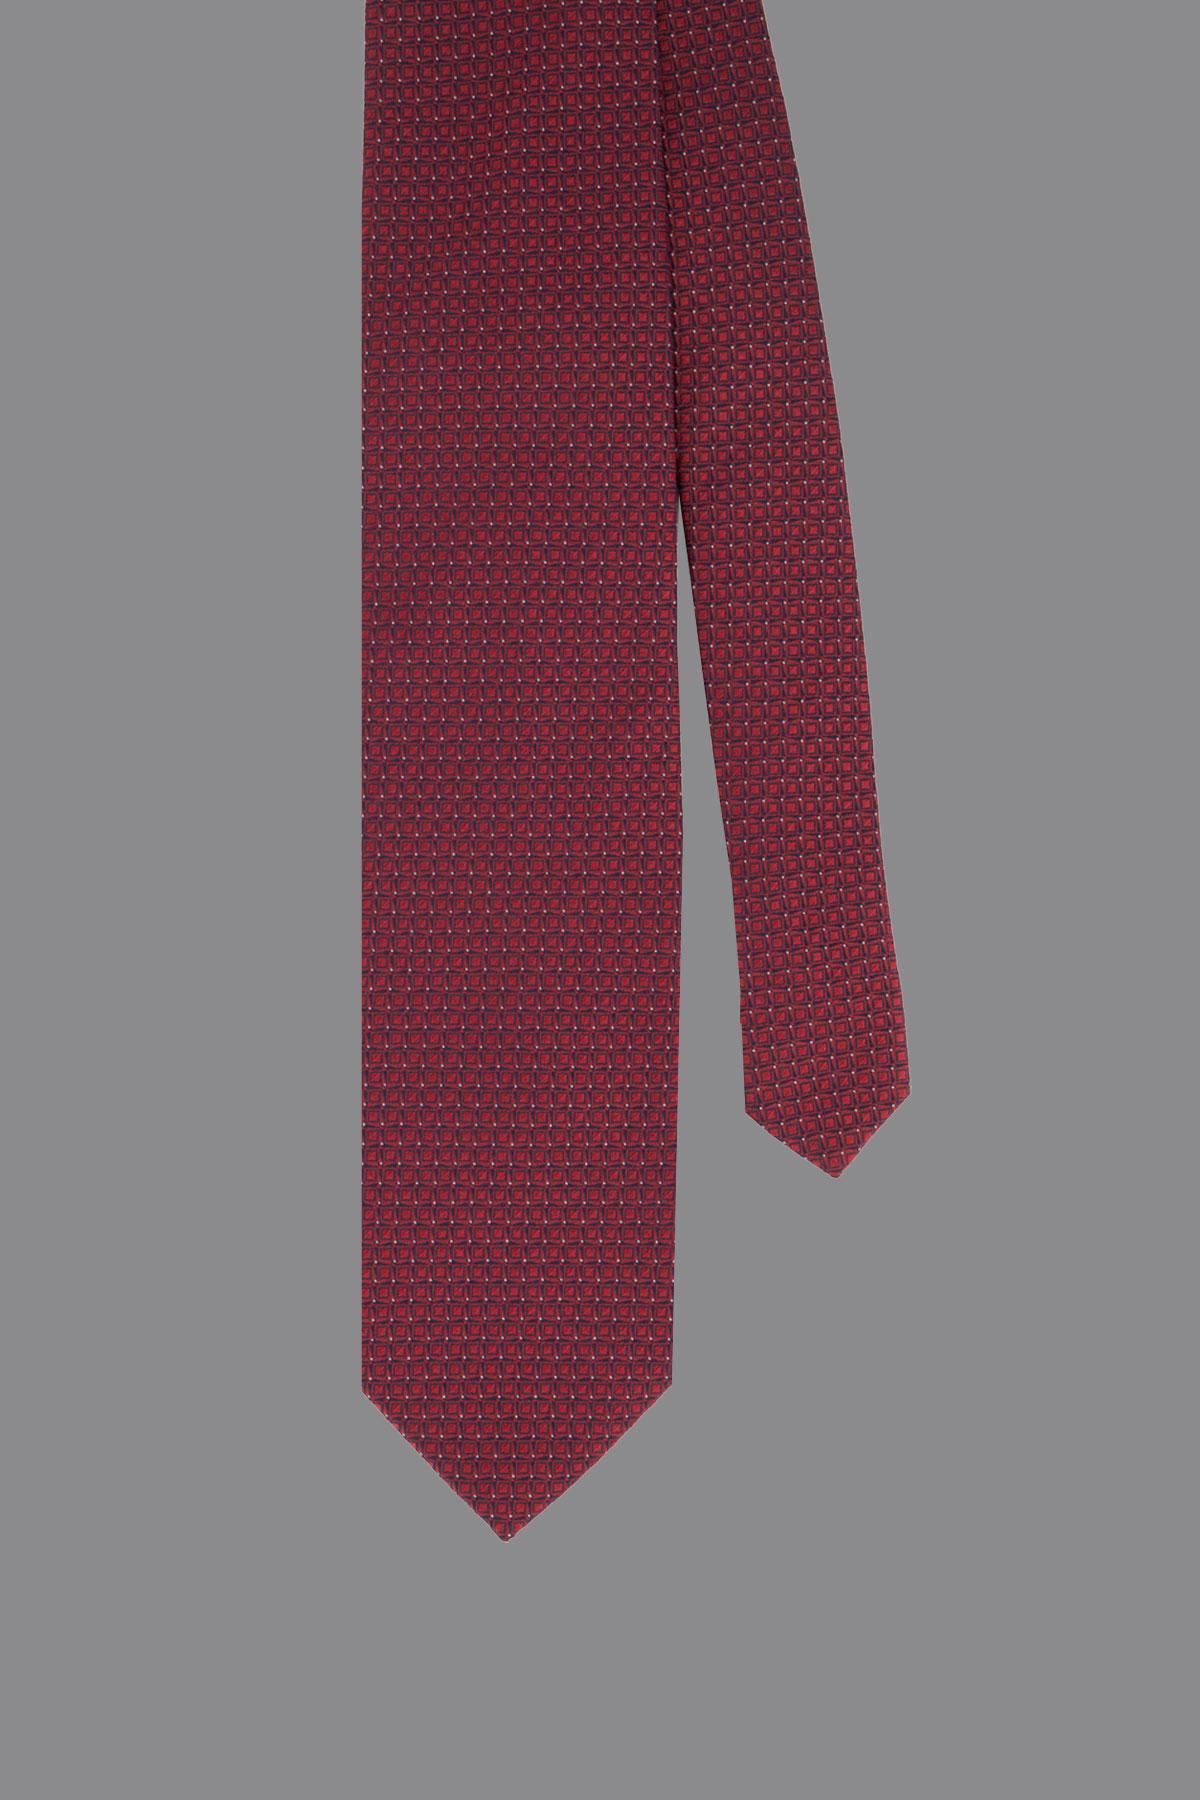 Corbata ROBERTS color Rojo